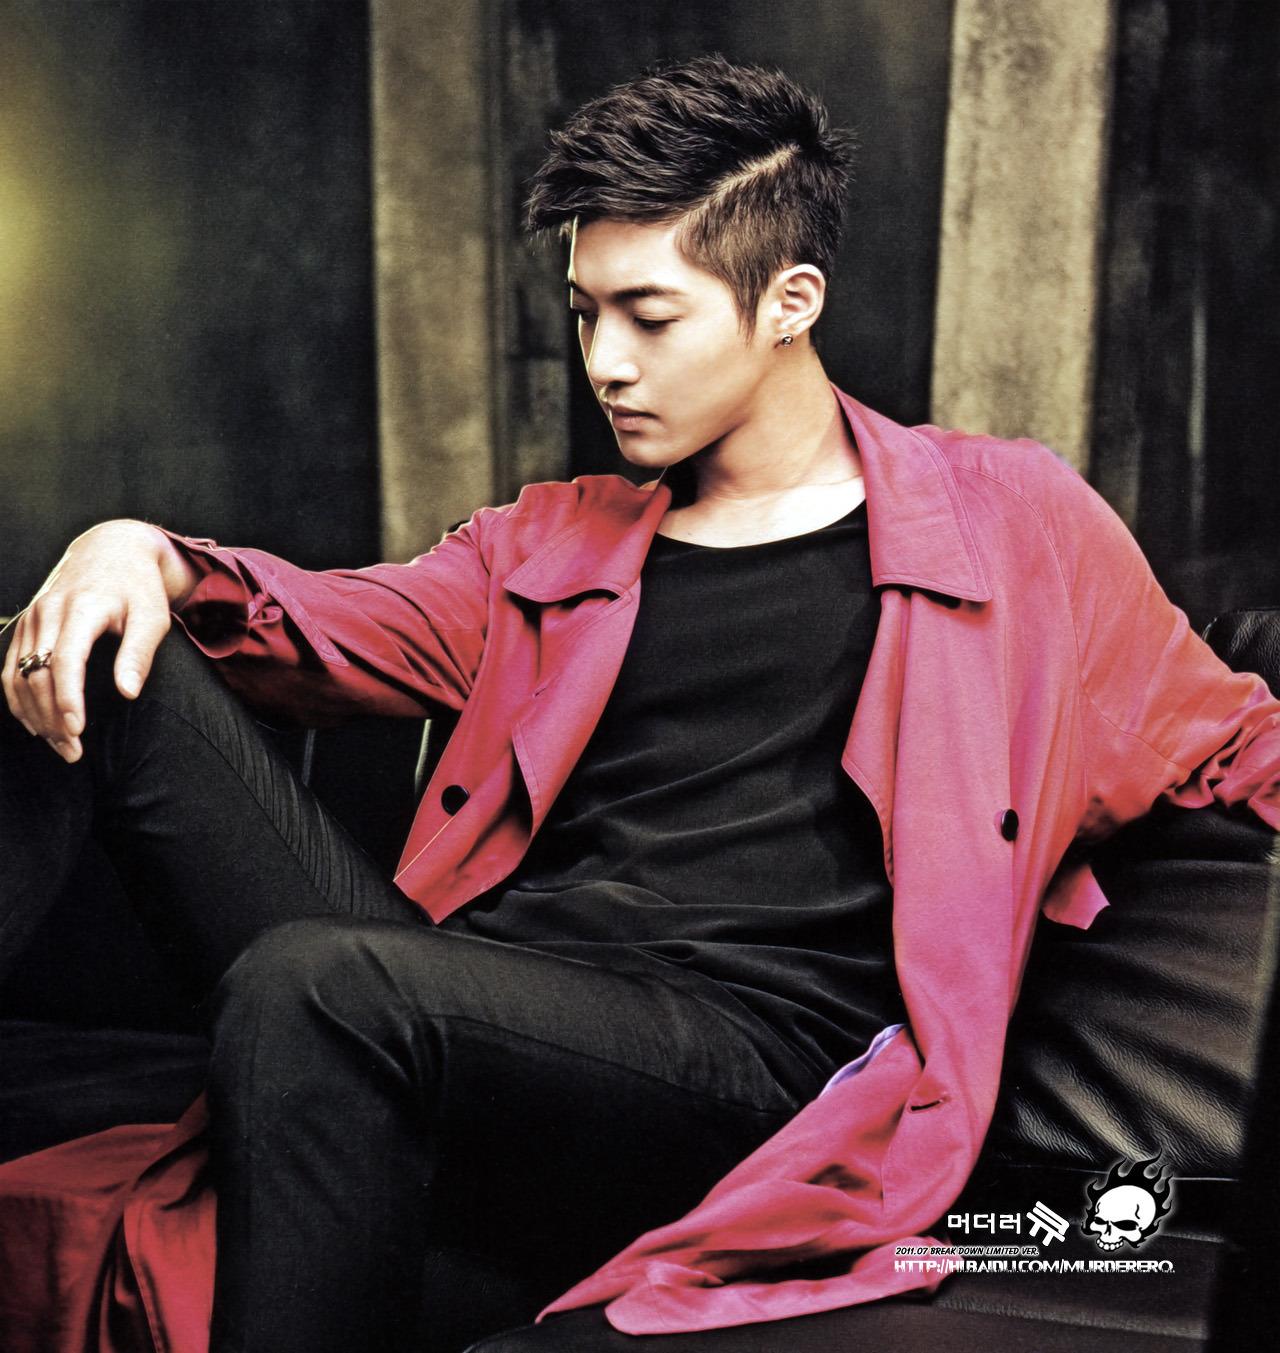 kathys bench kim hyun joong quotbreak downquot limited